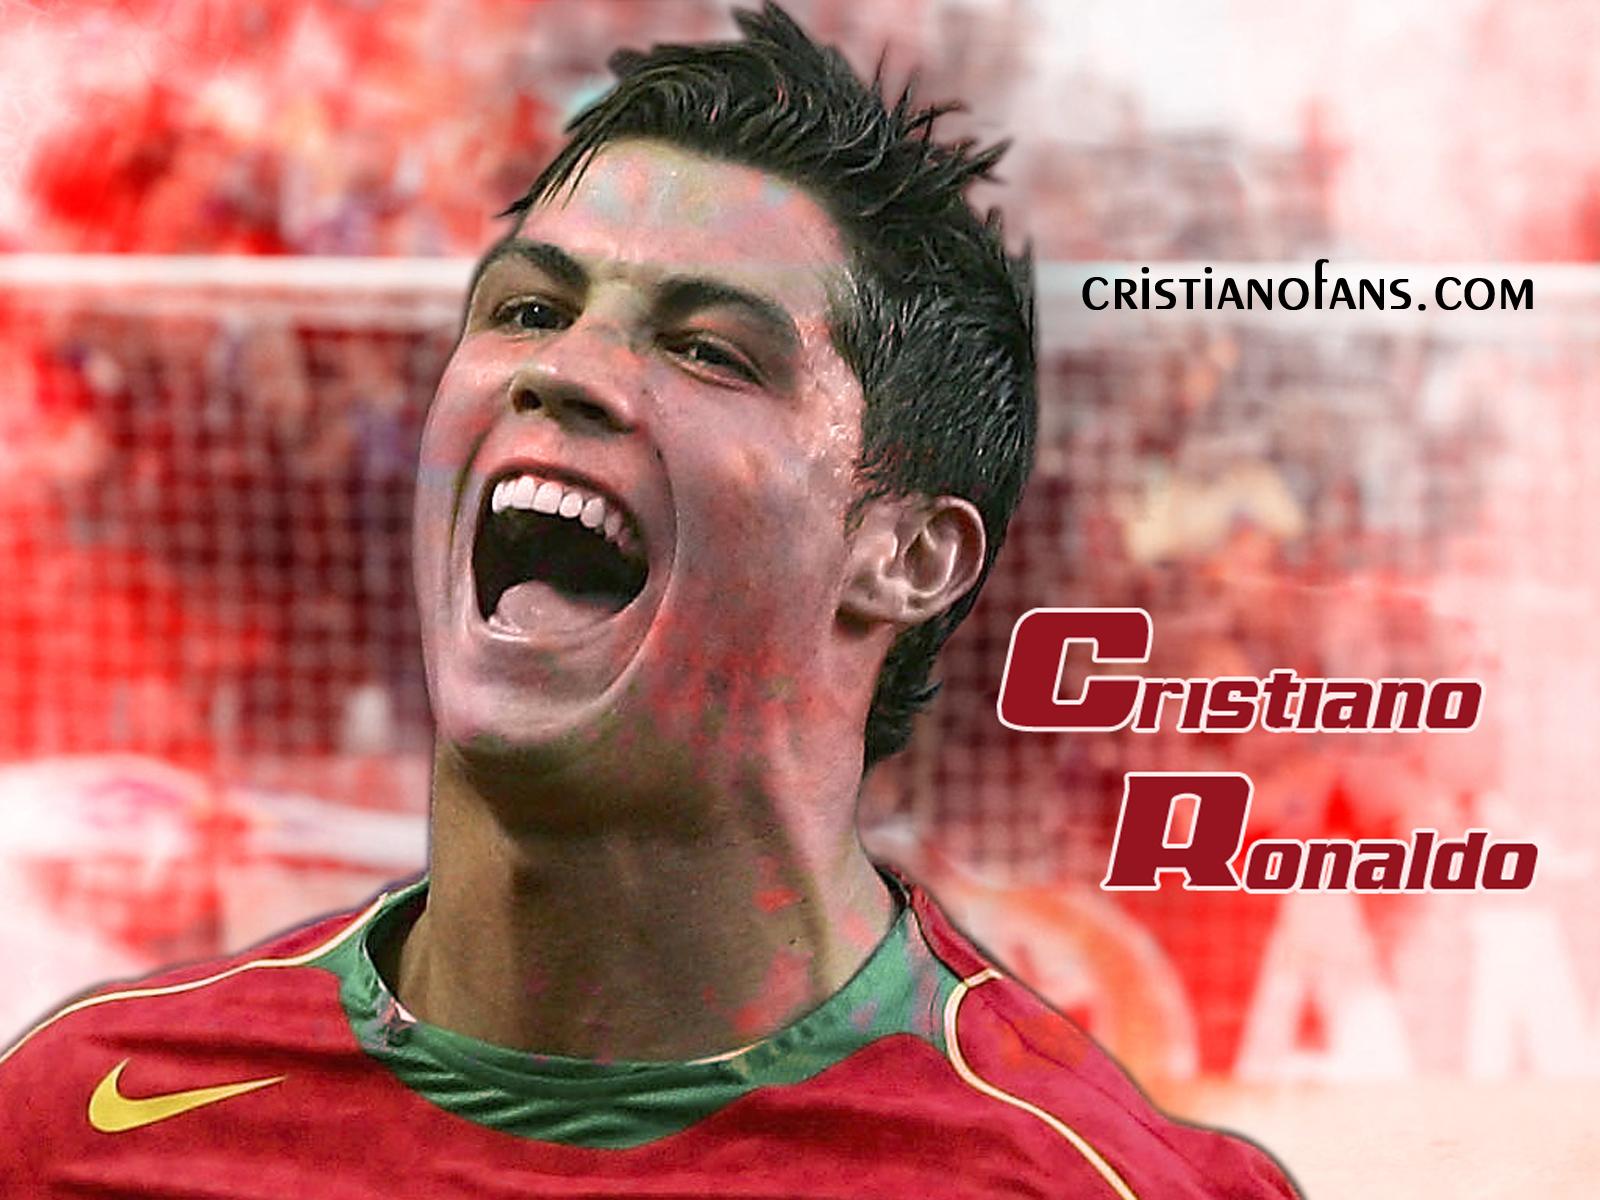 http://3.bp.blogspot.com/-lmAiPz_3MWE/Td2pUeq1P5I/AAAAAAAAAPg/Uli6LkQcwdo/s1600/Cristiano-Ronaldo-Hot-Wallpapers-3.jpg